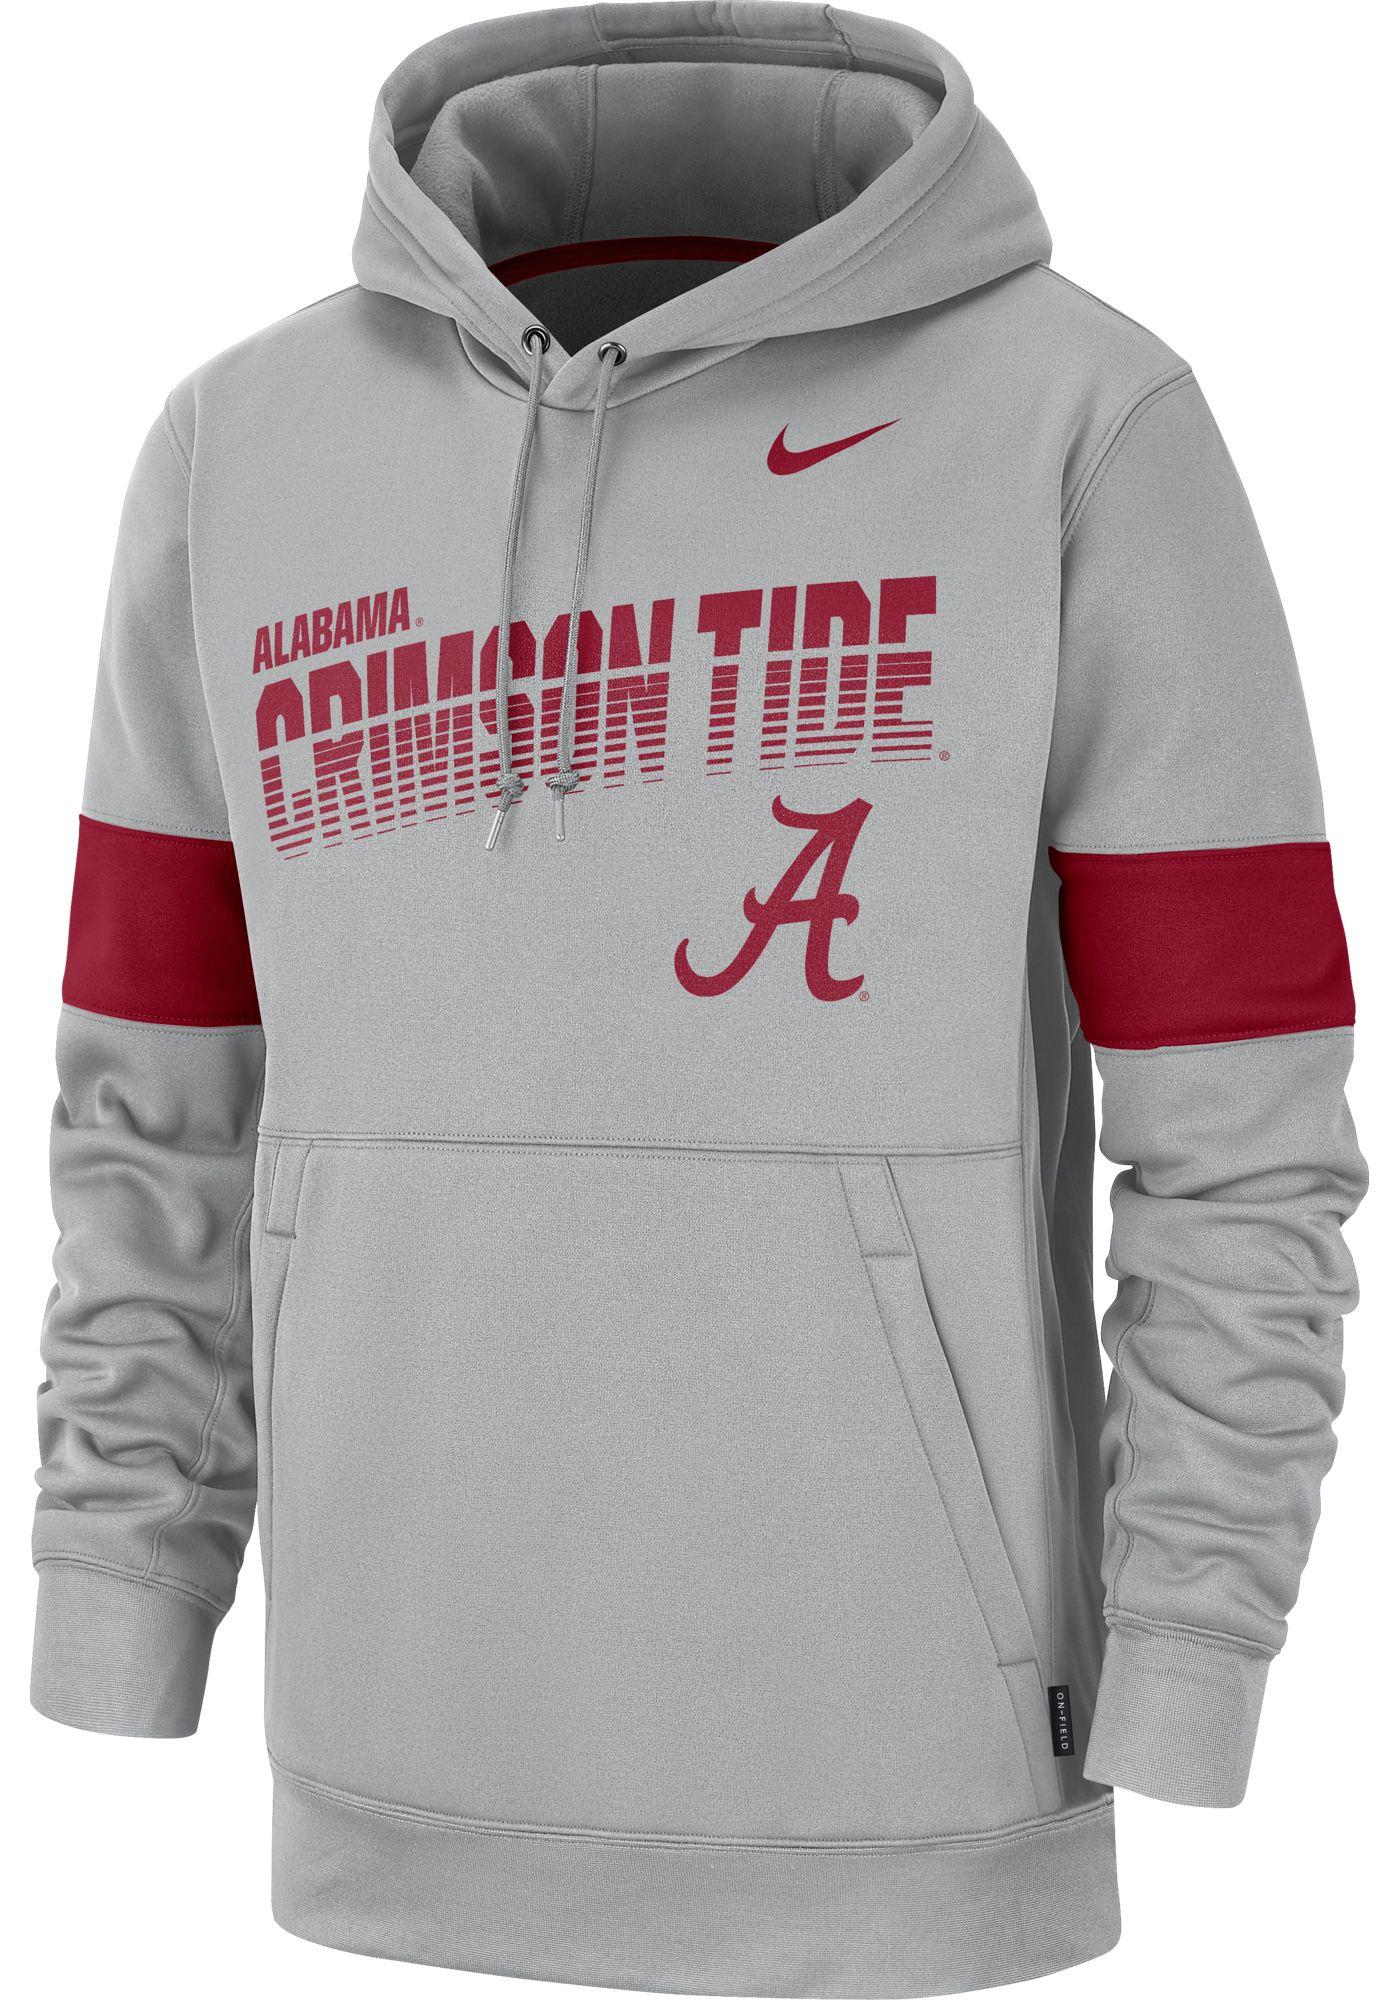 Nike Men's Alabama Crimson Tide Grey Therma Football Sideline Pullover Hoodie